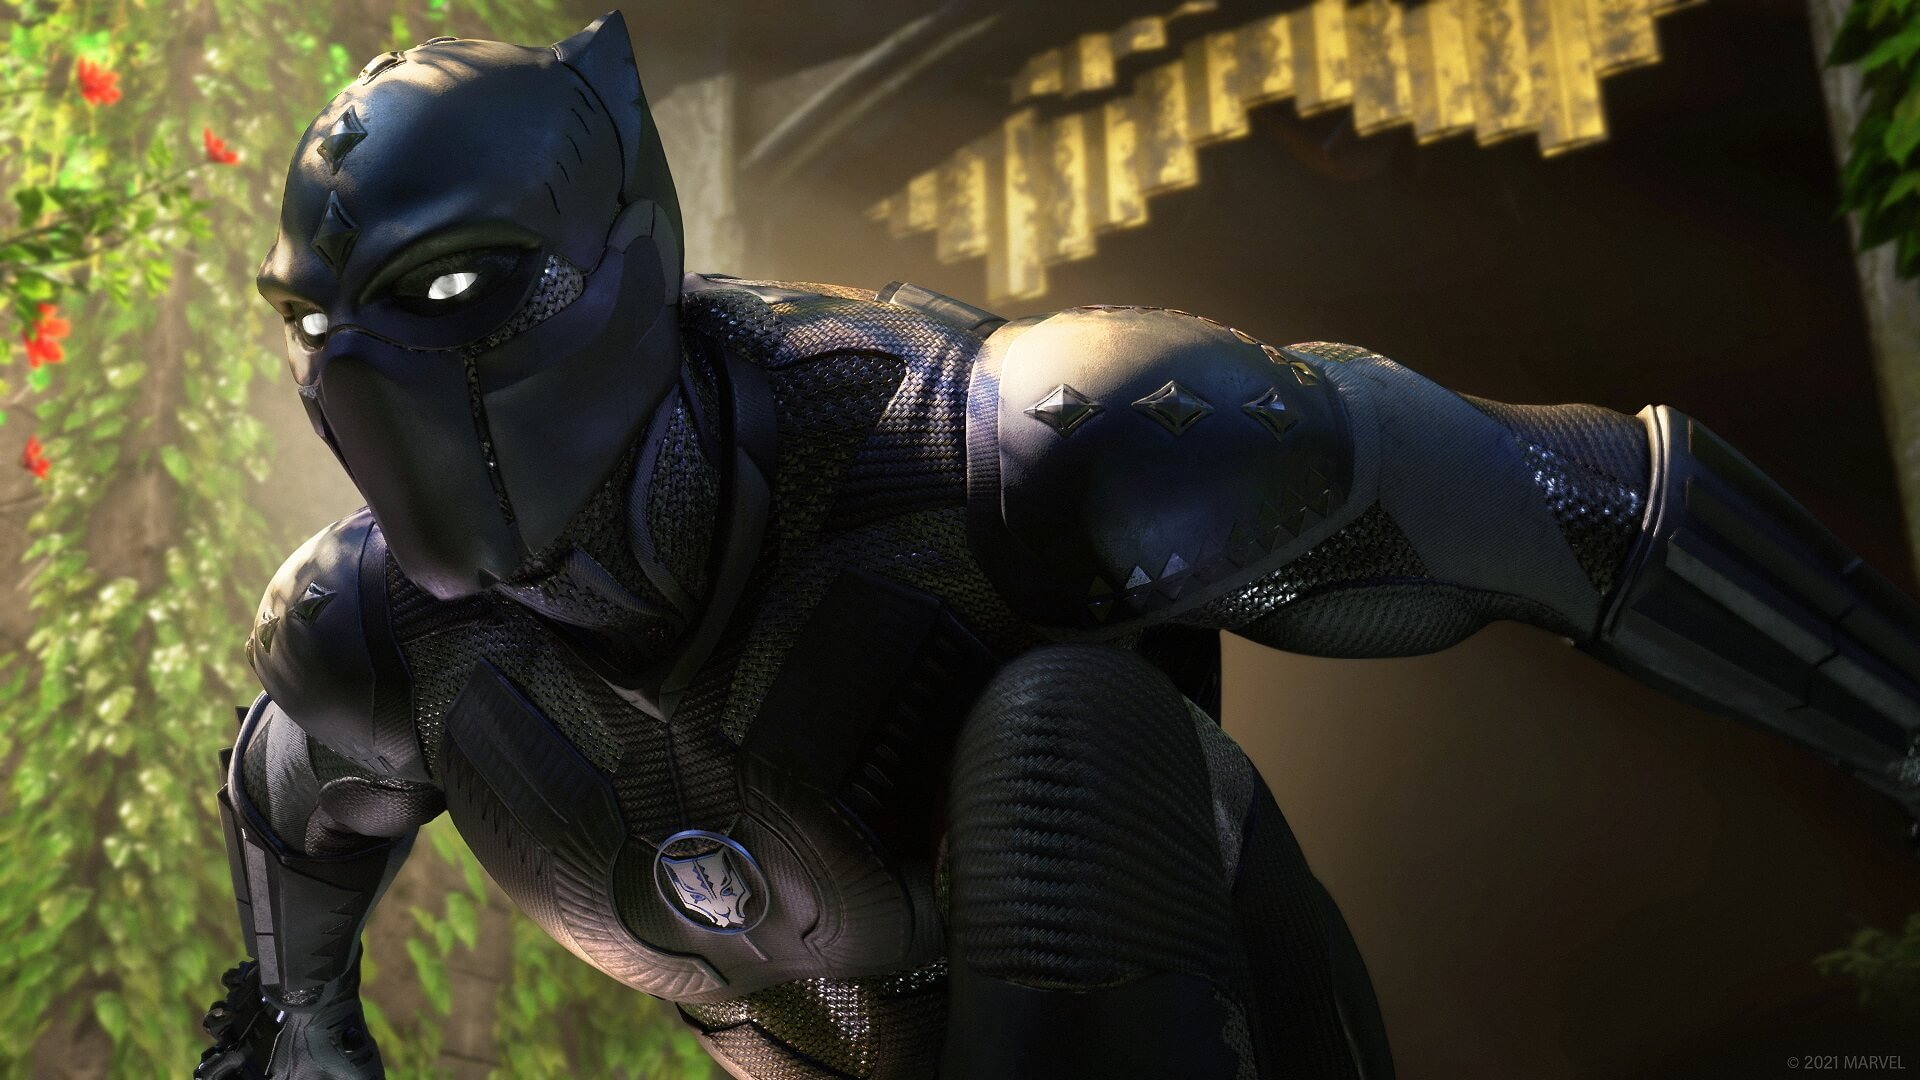 Chris Judge, voz de Kratos, interpretará a Black Panther en Marvel's Avengers